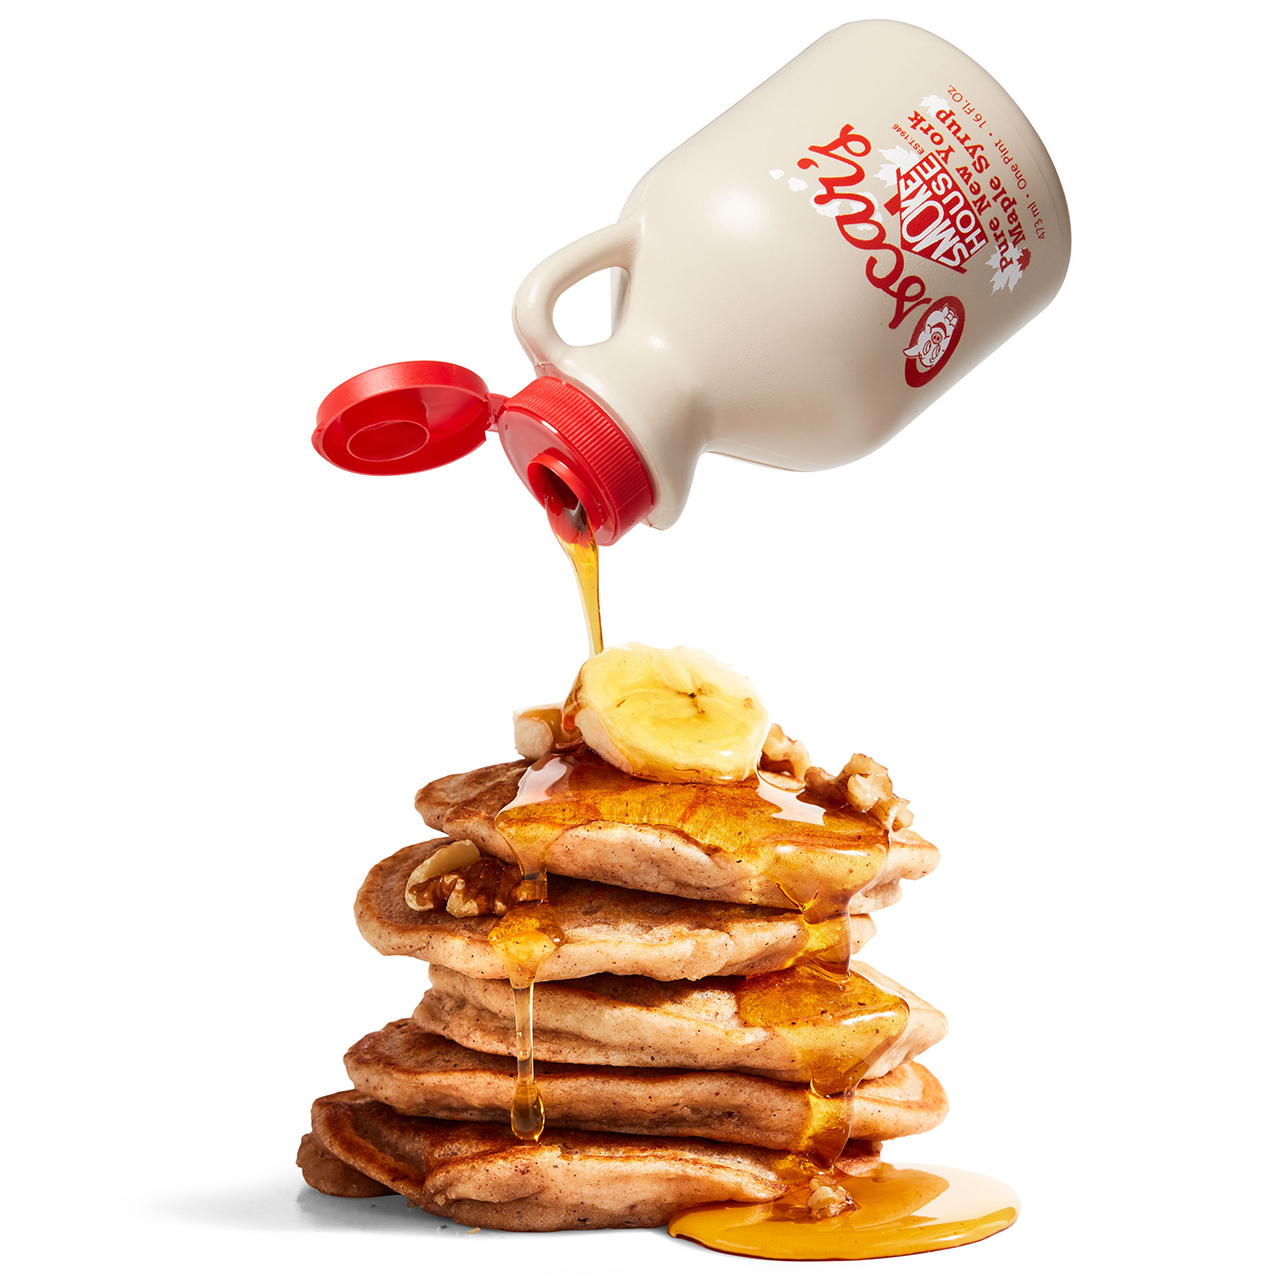 Breakfast Lover's Box Pancake Stack Syrup Bottle